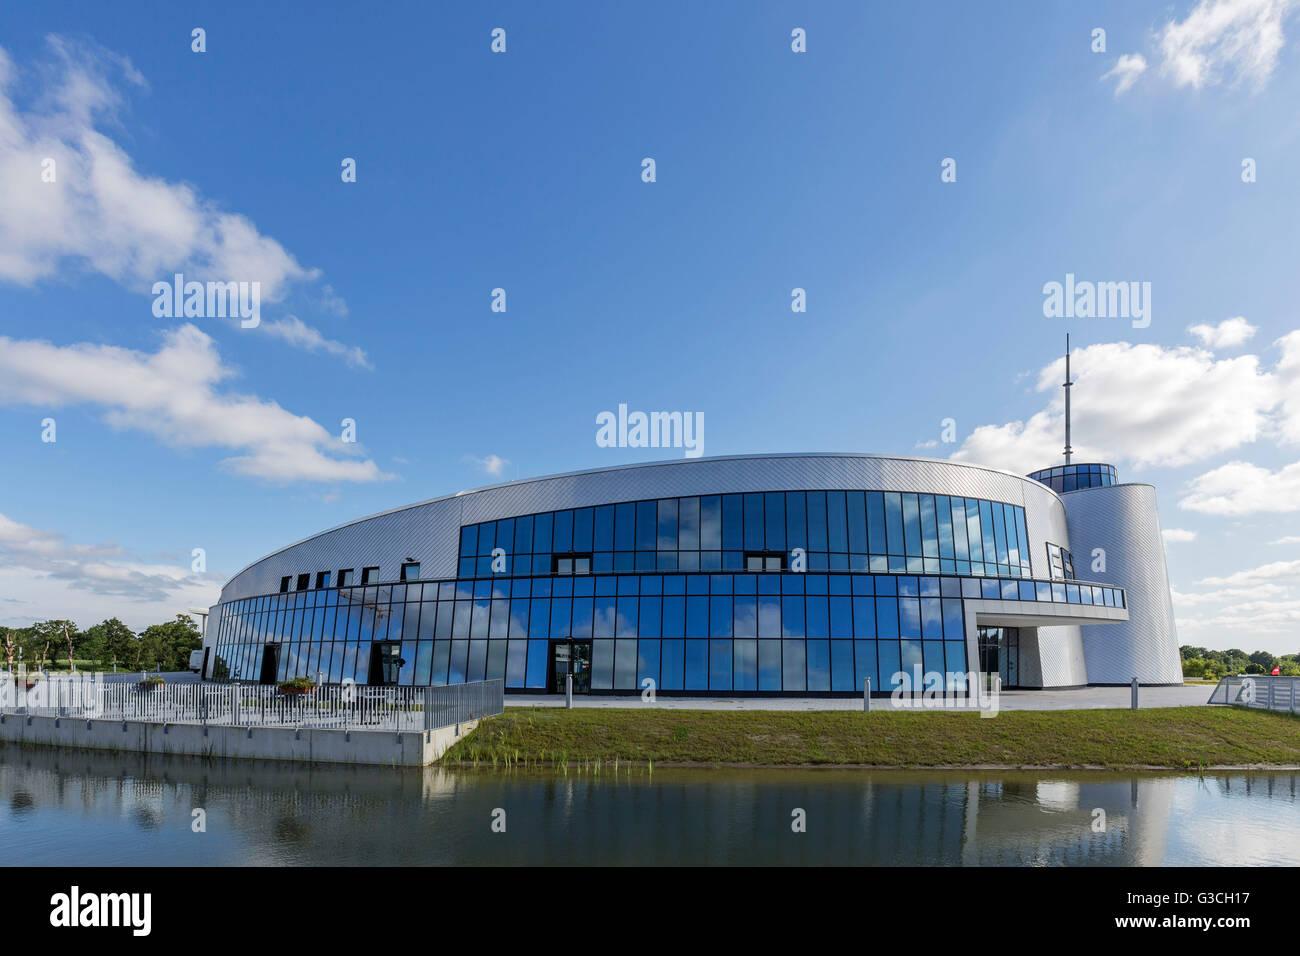 Energie-, Bildungs- und Erlebniszentrum', EEZ, (Energy, education and experience center), Aurich, East Frisia, - Stock Image